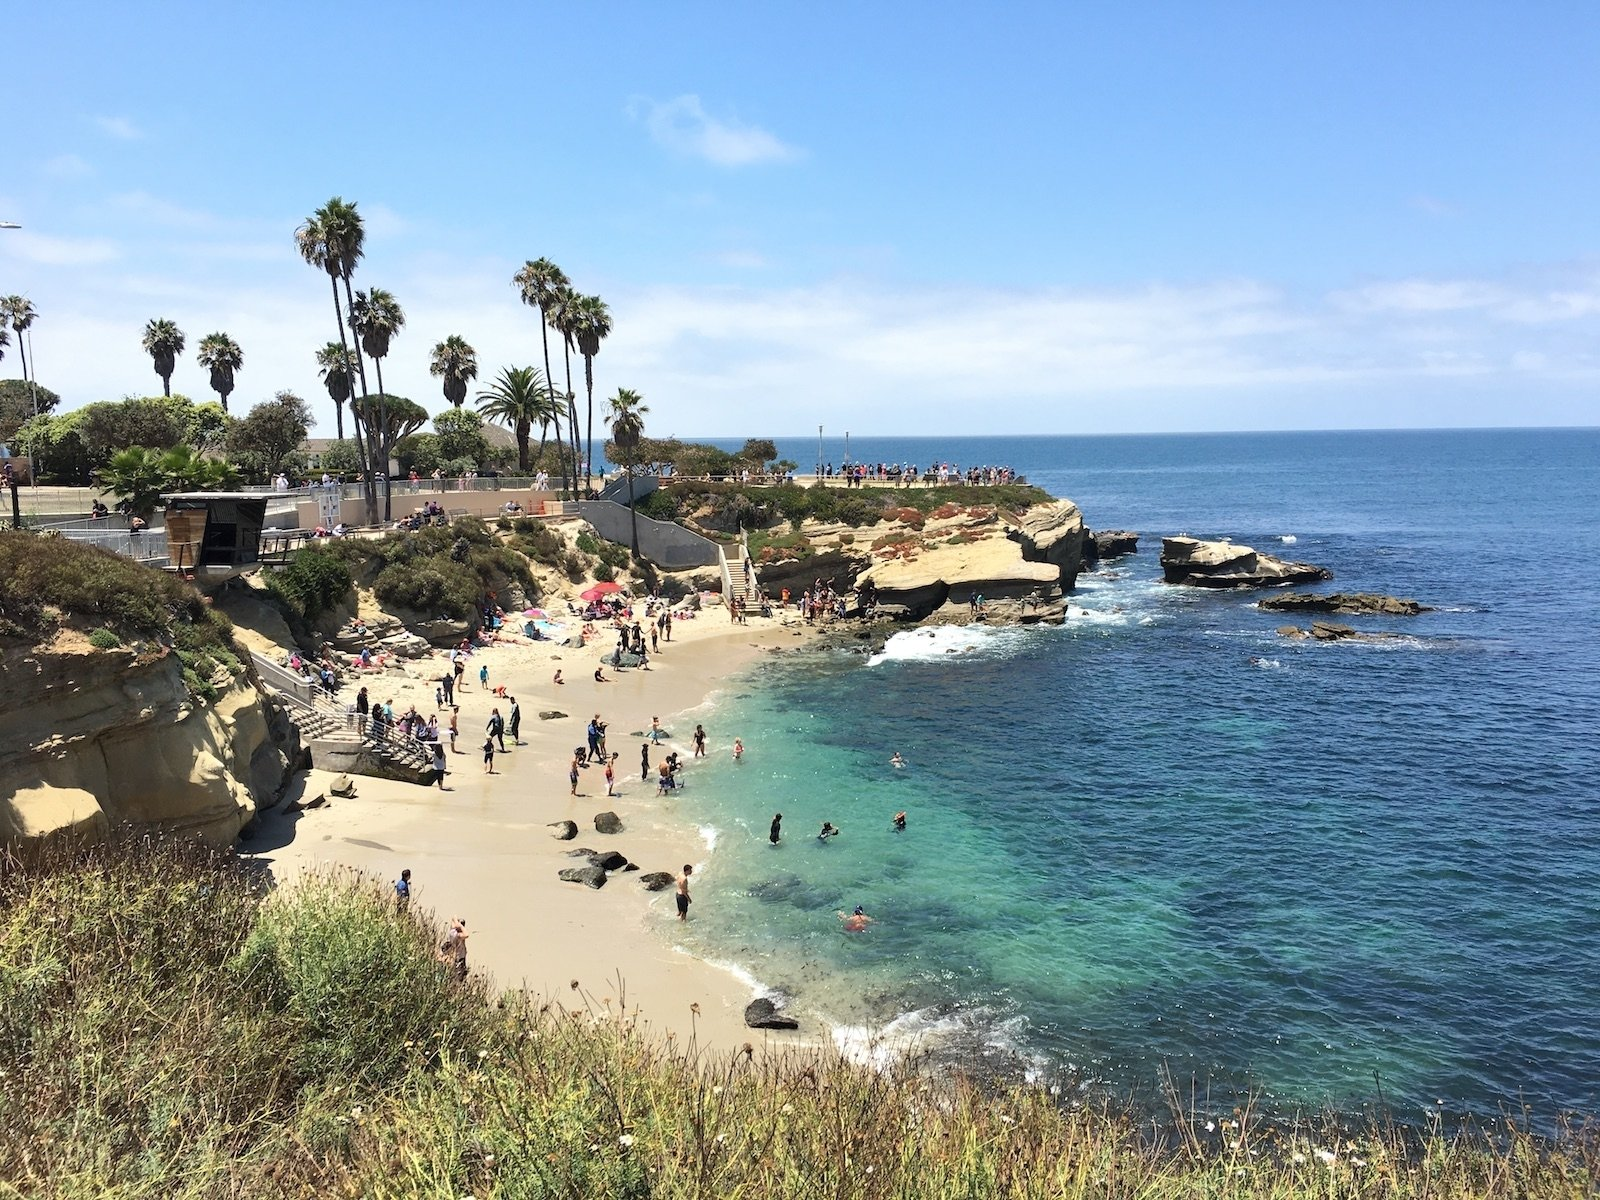 10 Stylish Fun Date Ideas San Diego 10 fun date ideas for couples in la jolla 2021